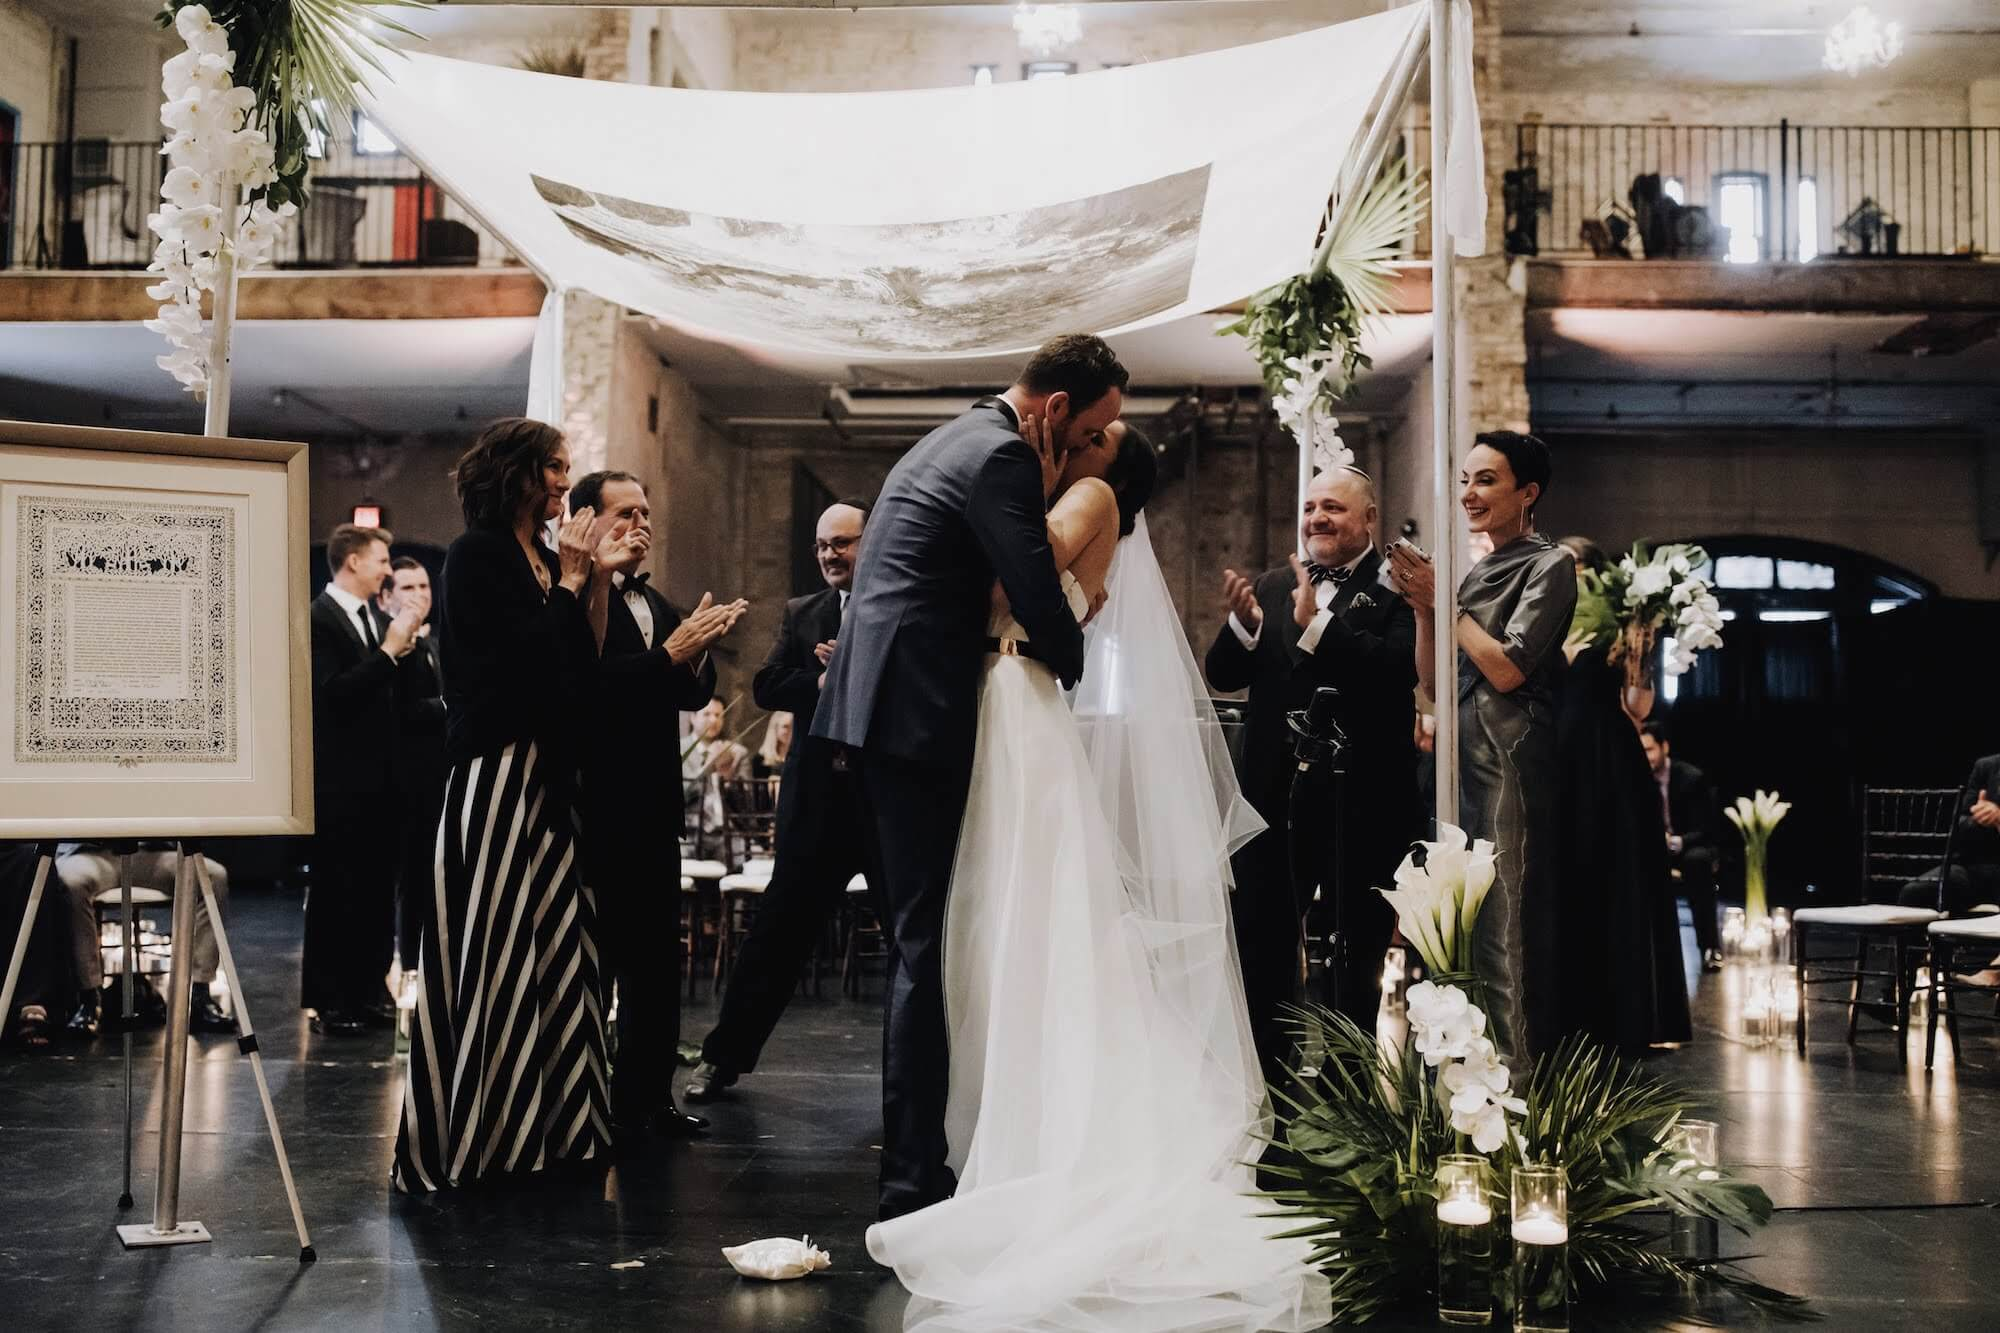 engle-olson-video-matt-lien-photography-rita-evan-wedding-30.jpg